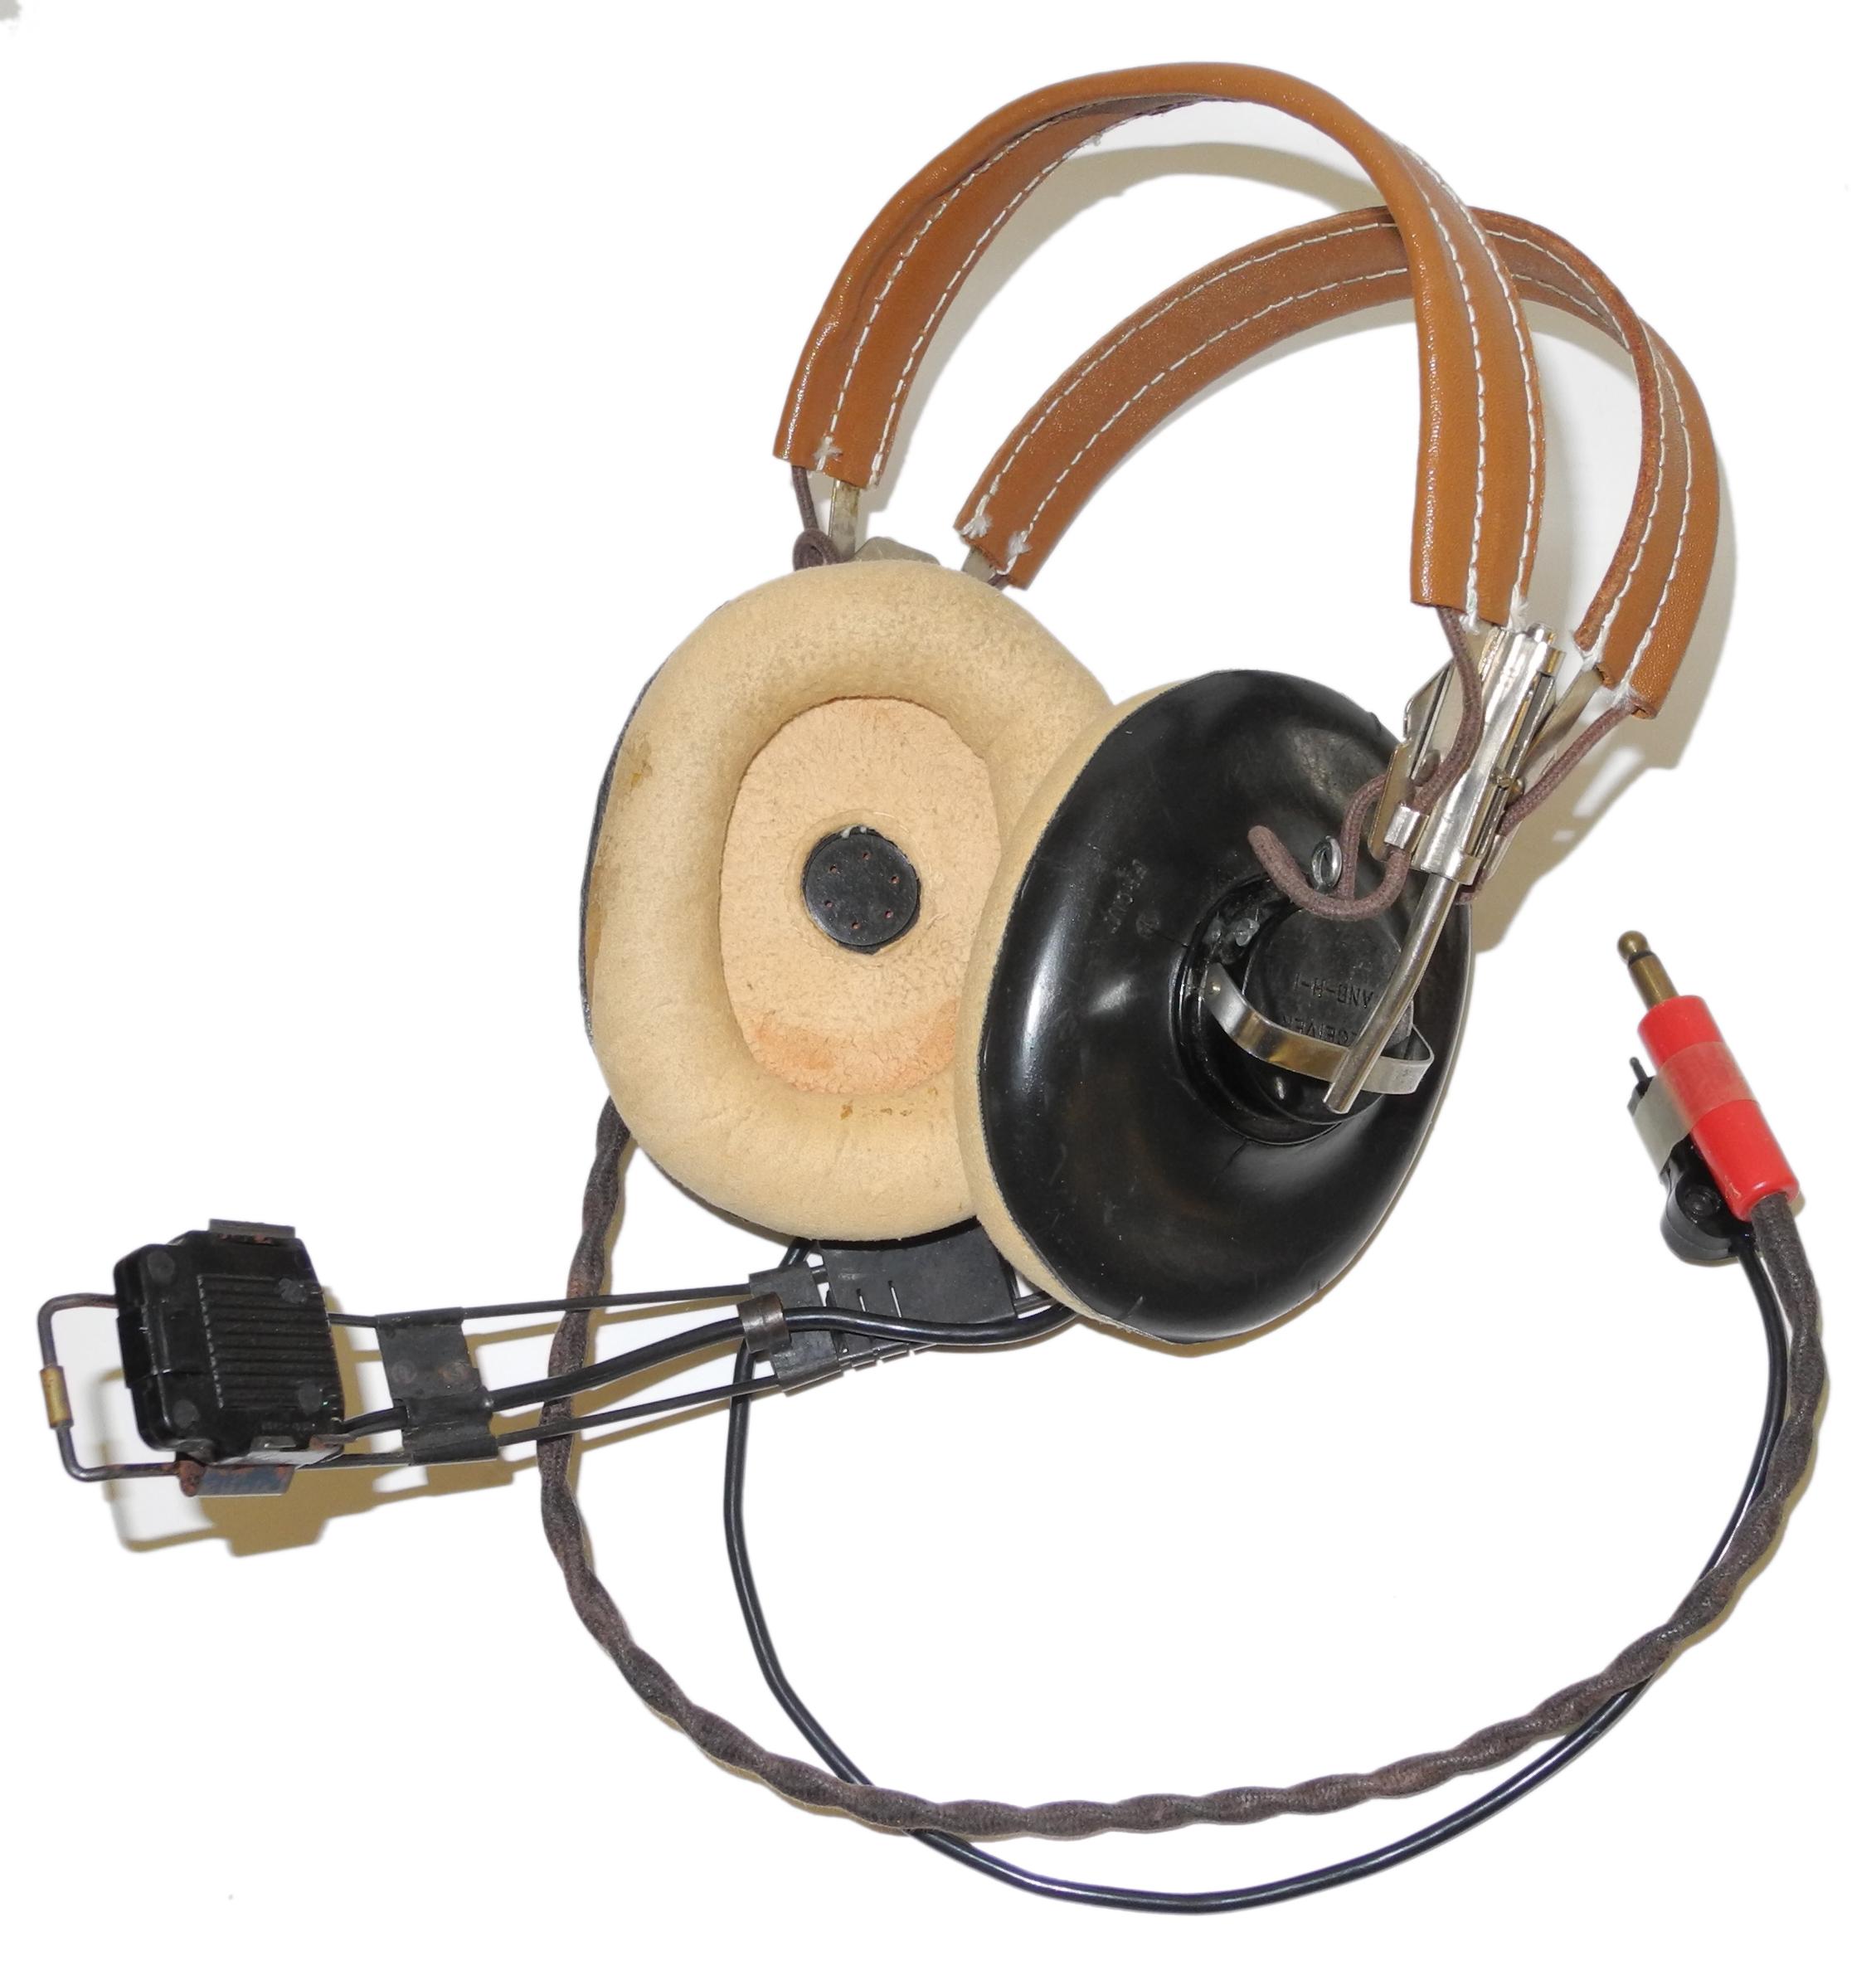 AAF HB-7 headset with boom mic.